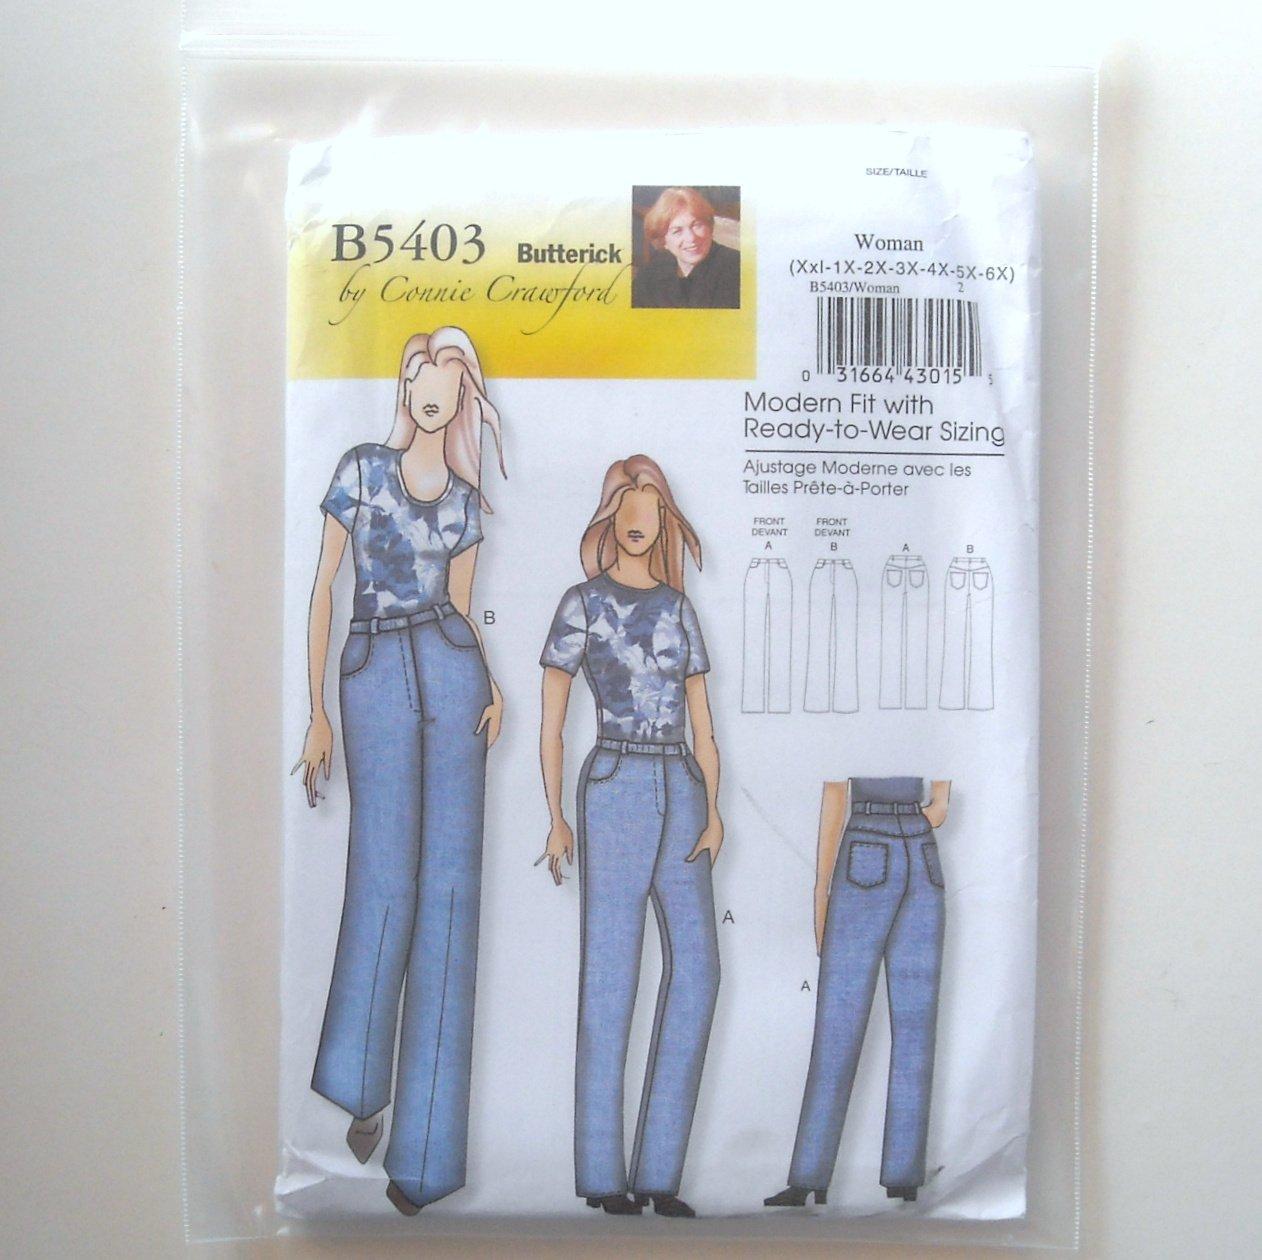 Butterick Pattern B5403 Connie Crawford Size XXL - 6X Womens Jeans